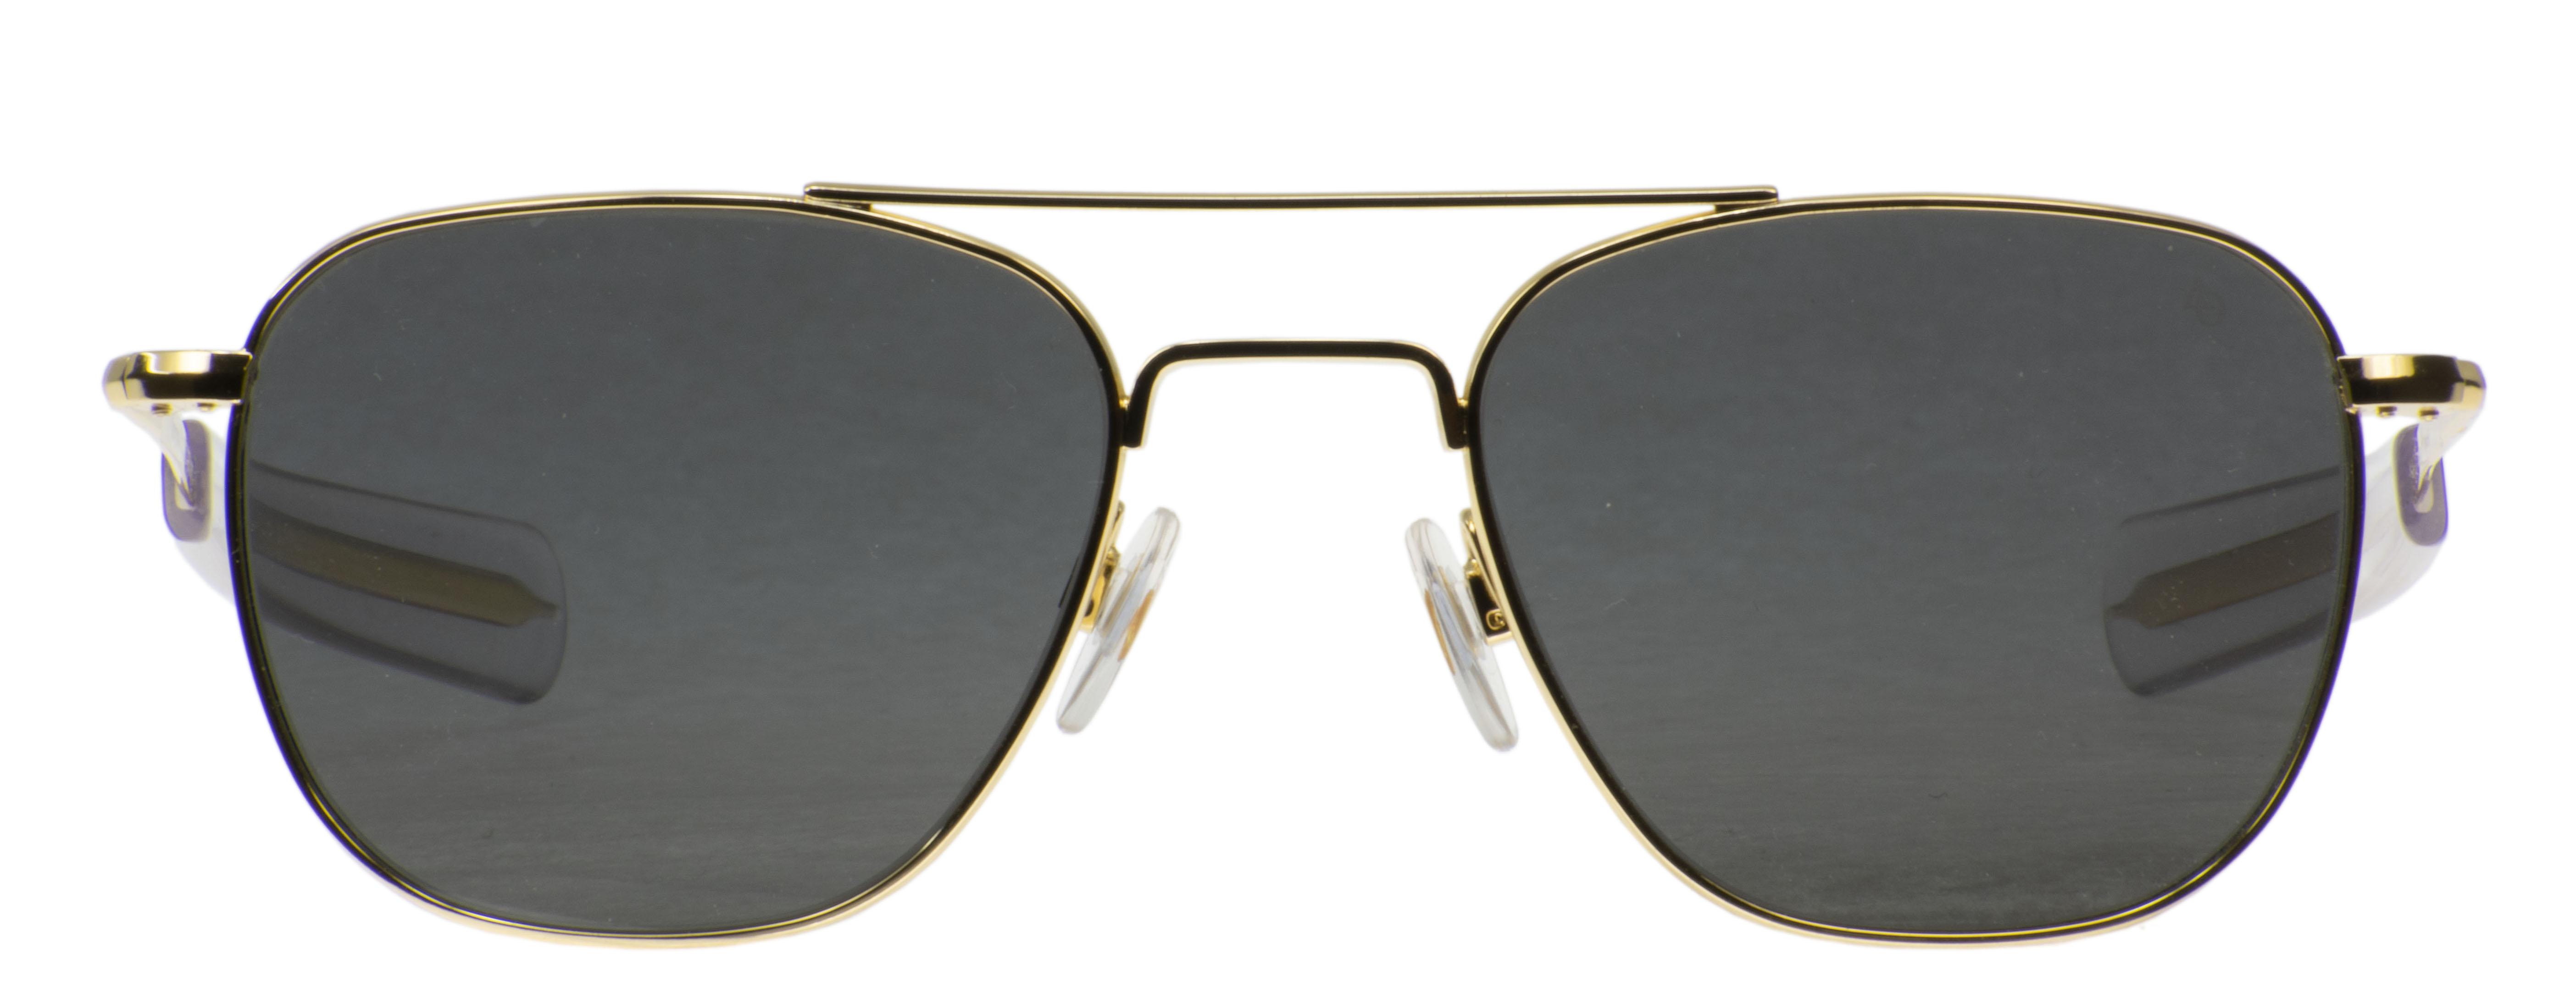 American Optical AO Original Pilot 52 Gold_GR(SUN) ¥32,000 01